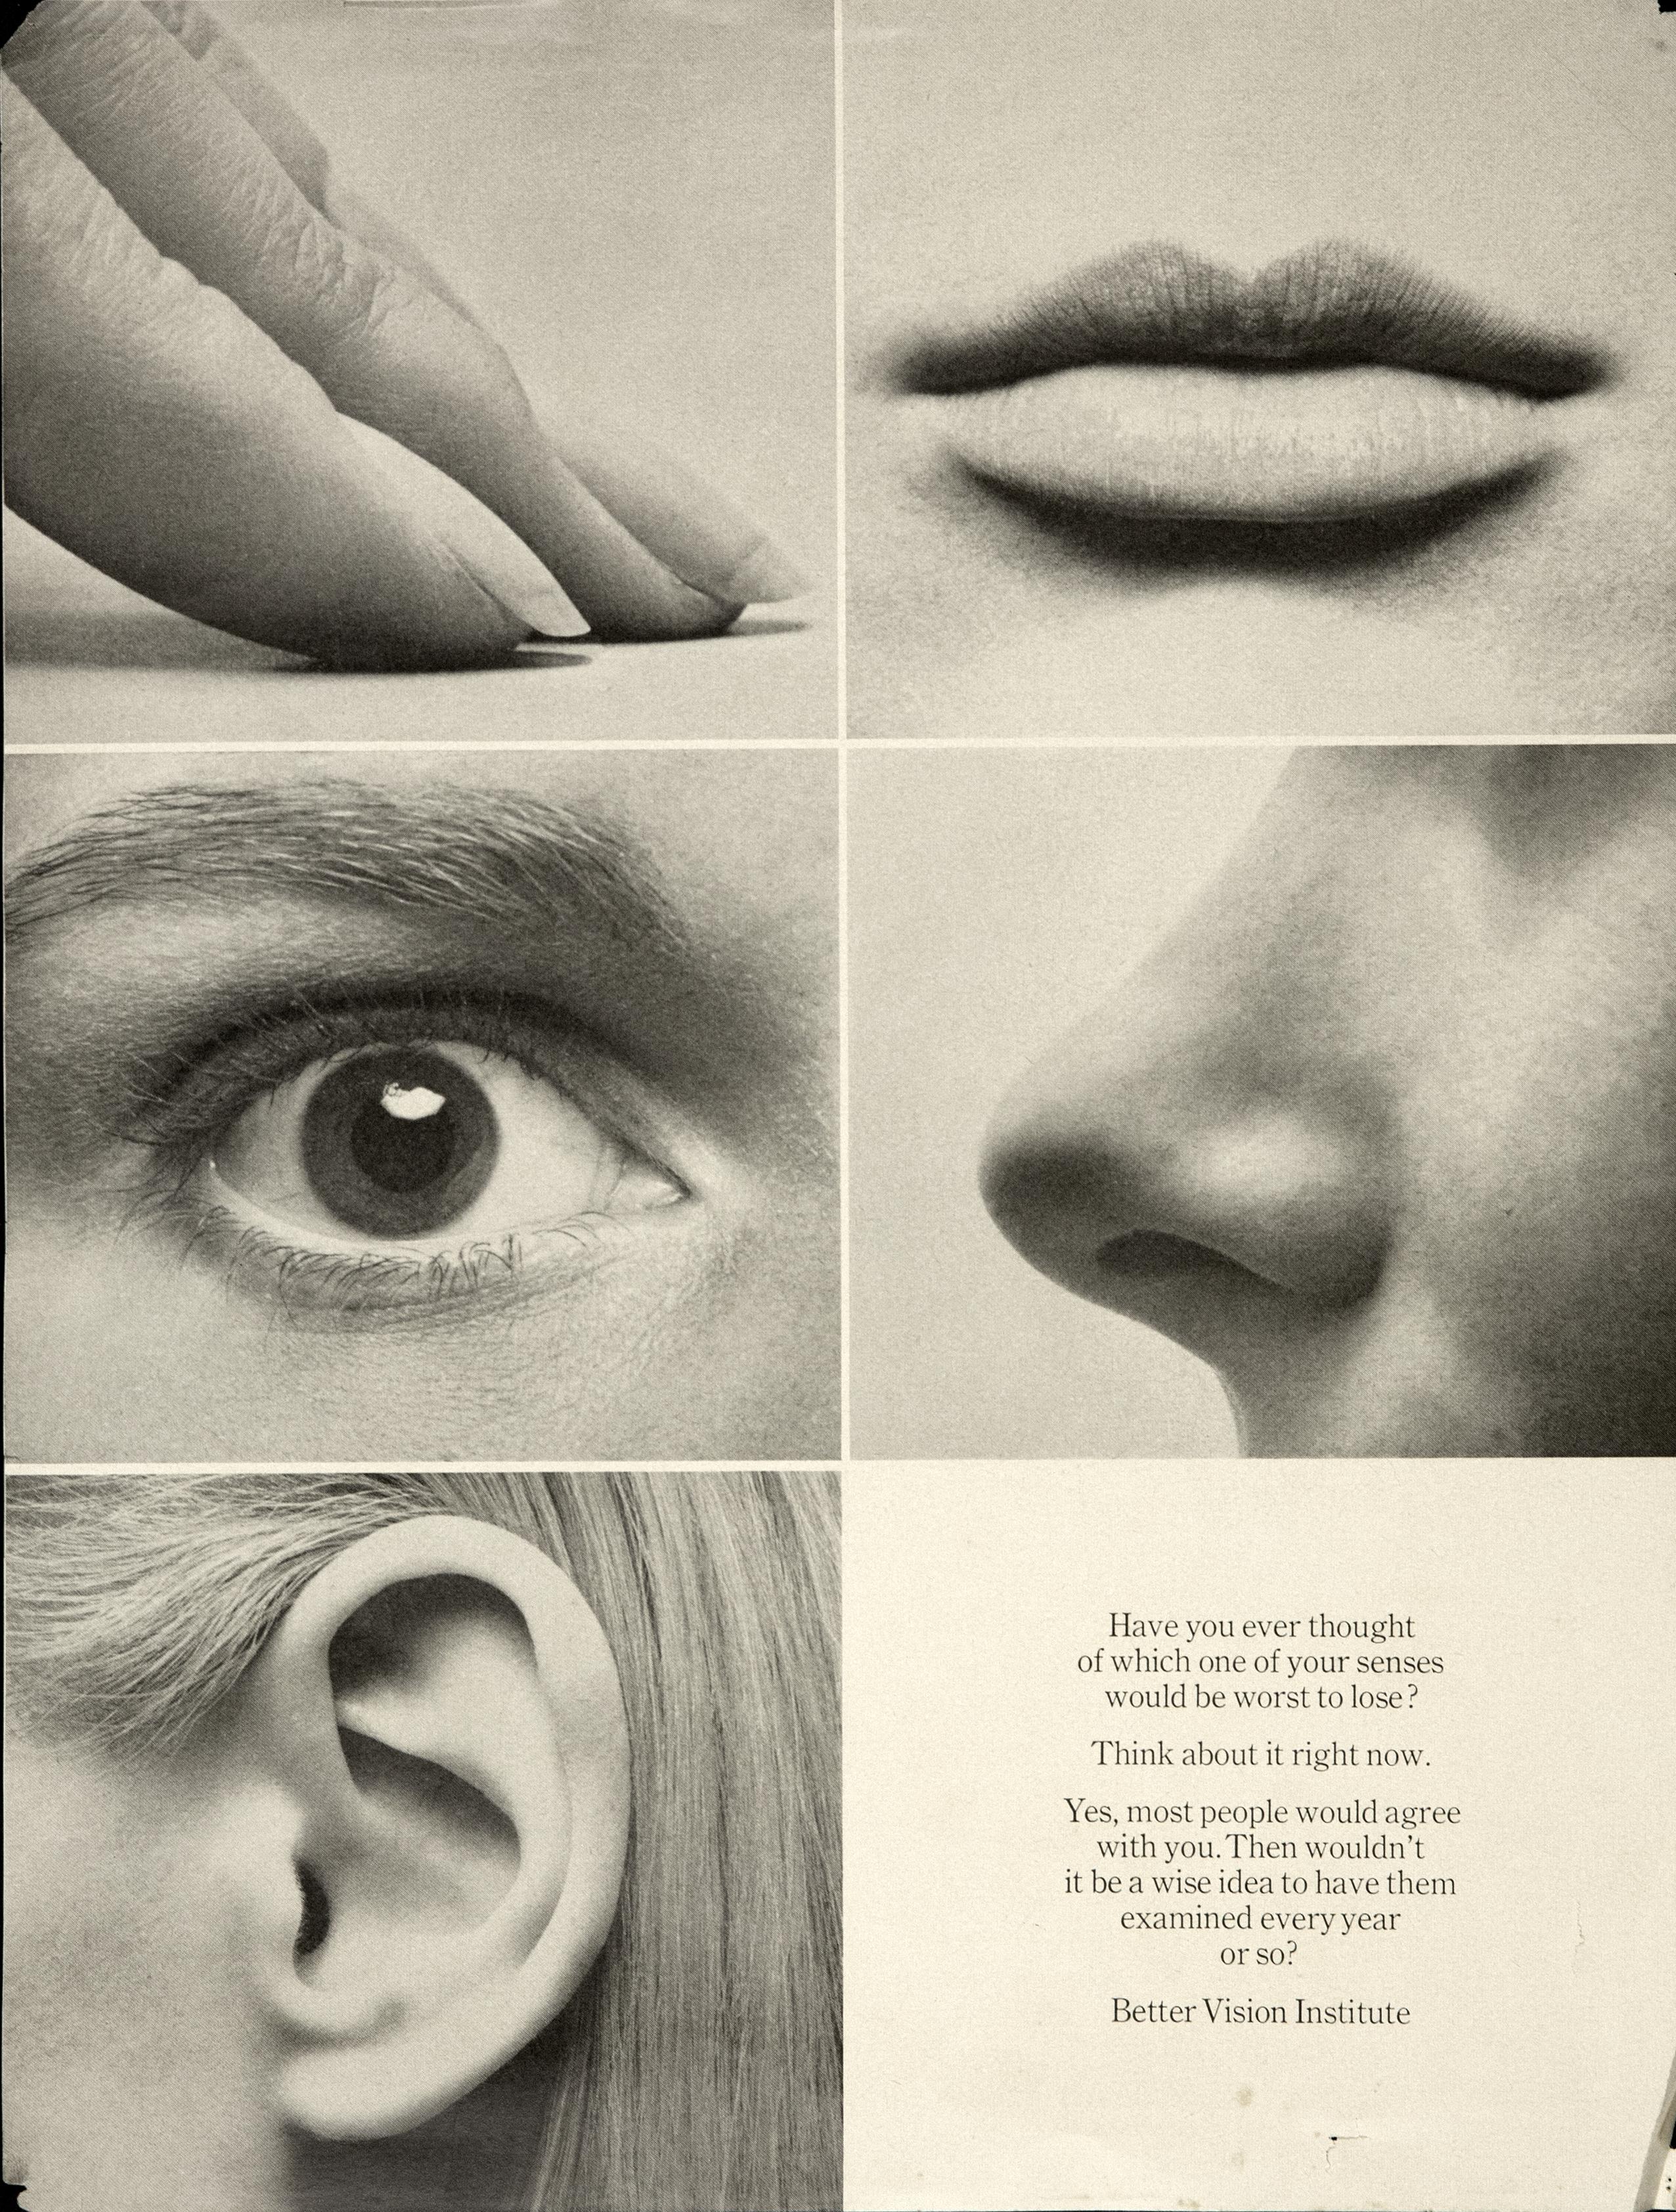 Better Vision Institute 'Ears, Eyes' Len Sirowitz, DDB